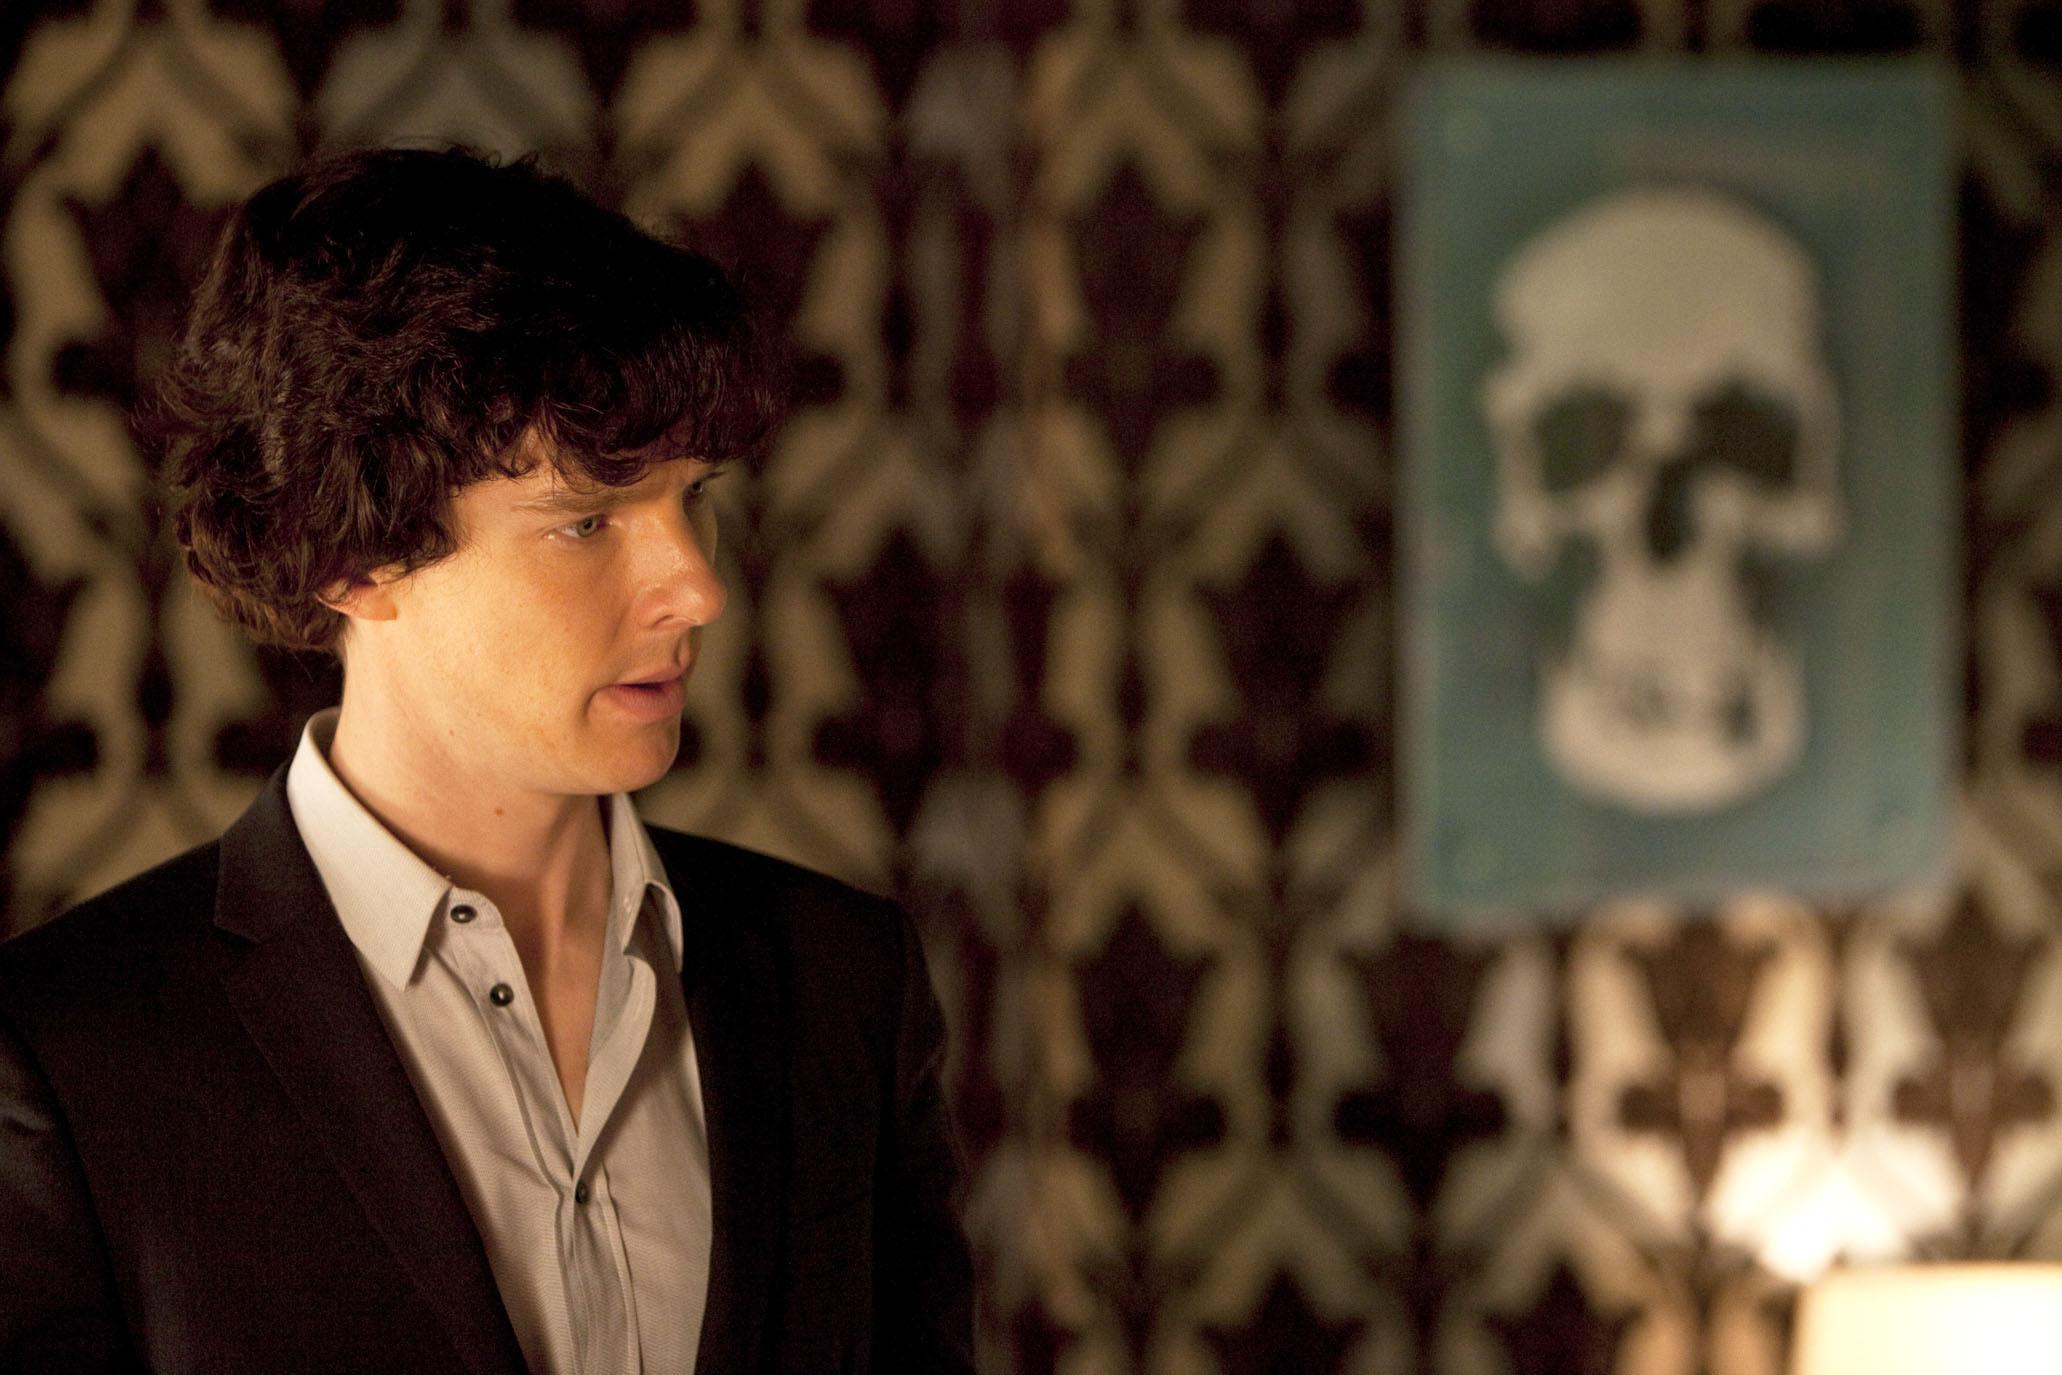 Promotional photo portraying Benedict Cumberbatch as Sherlock Holmes.